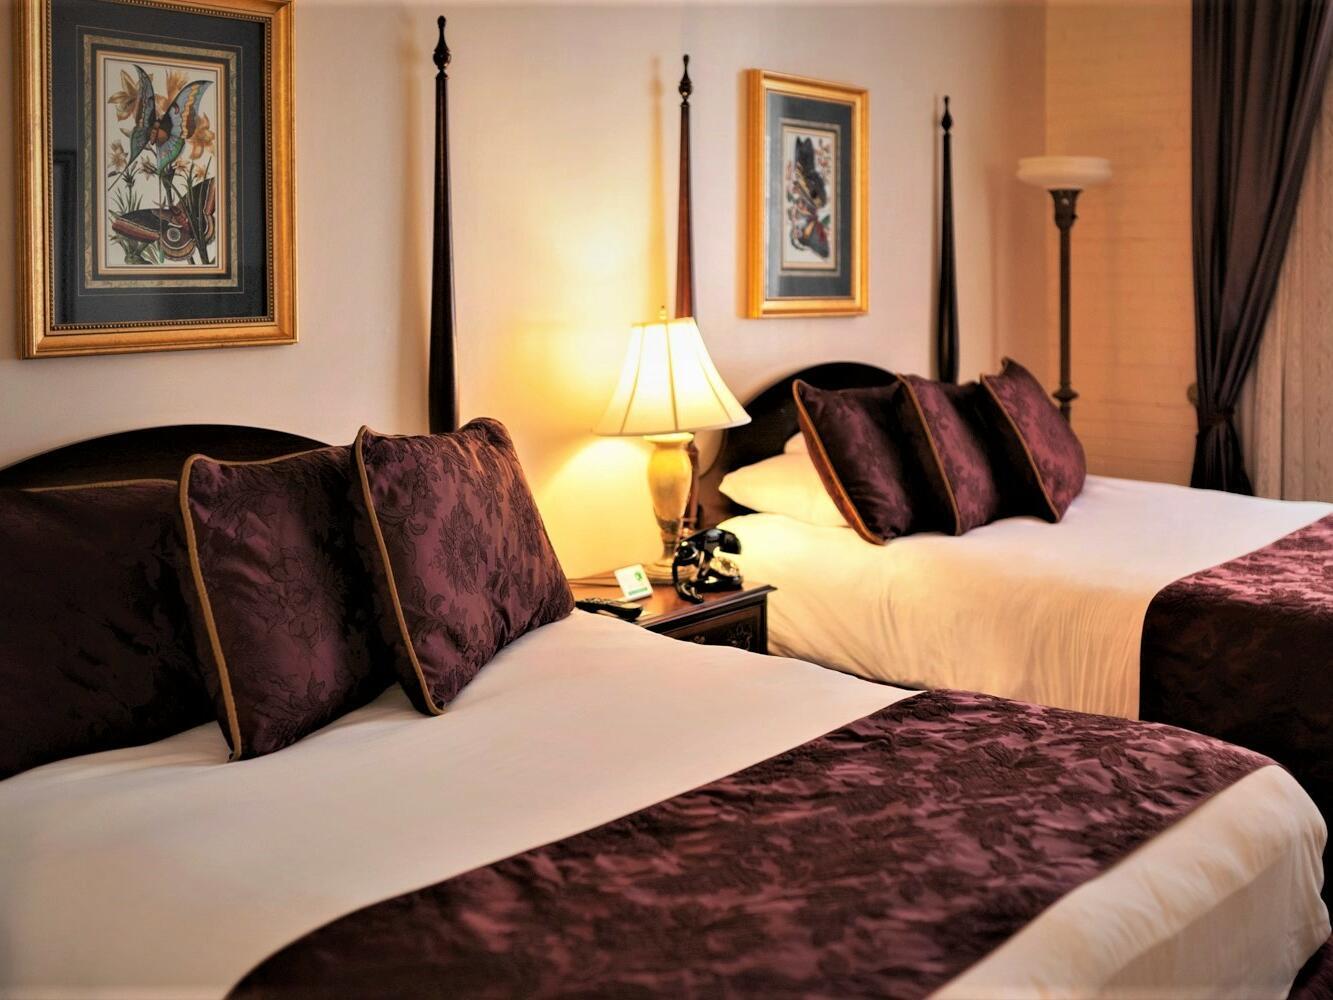 Bedroom of Double Queen Studio Suite at Hotel at Old Town